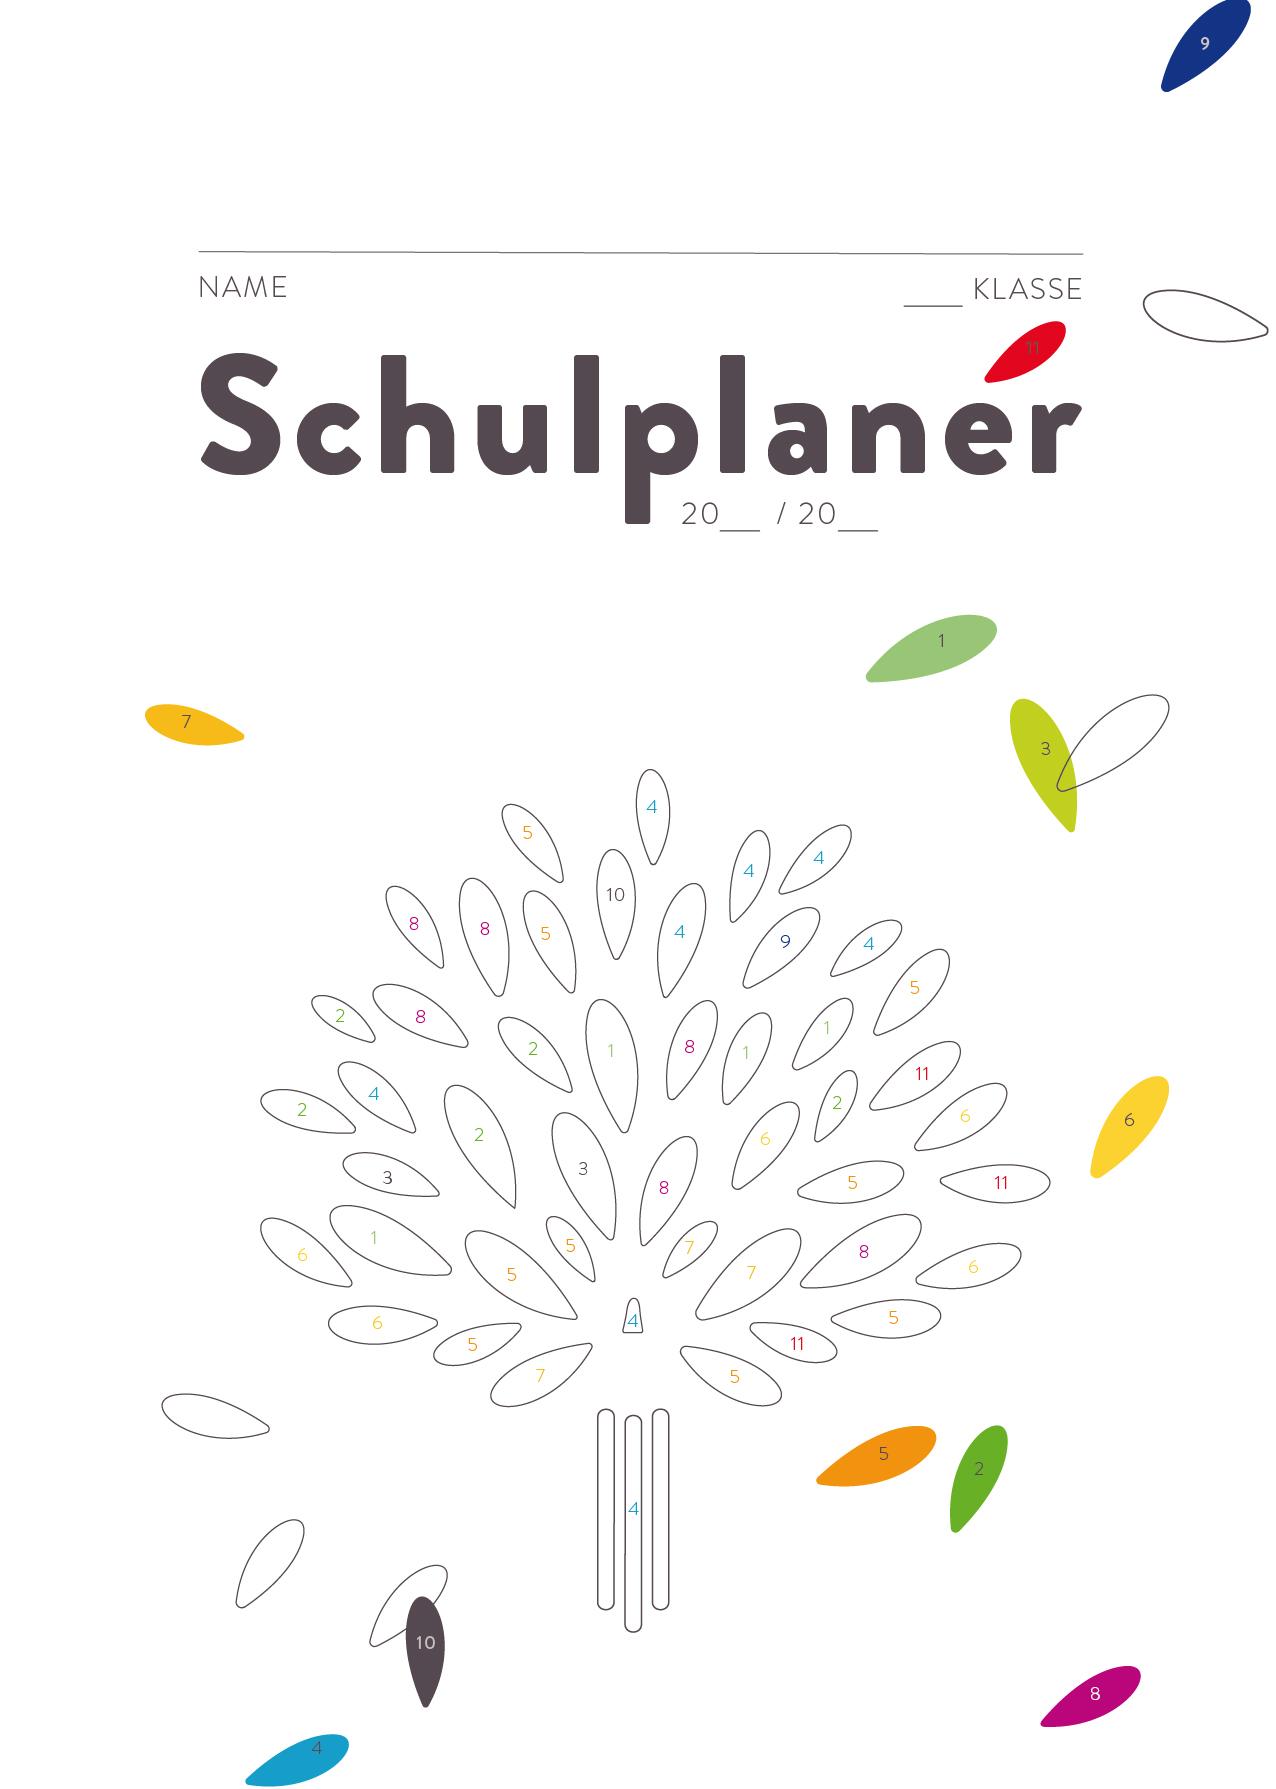 IGS-Schulplaner-Deckblatt-01.jpg